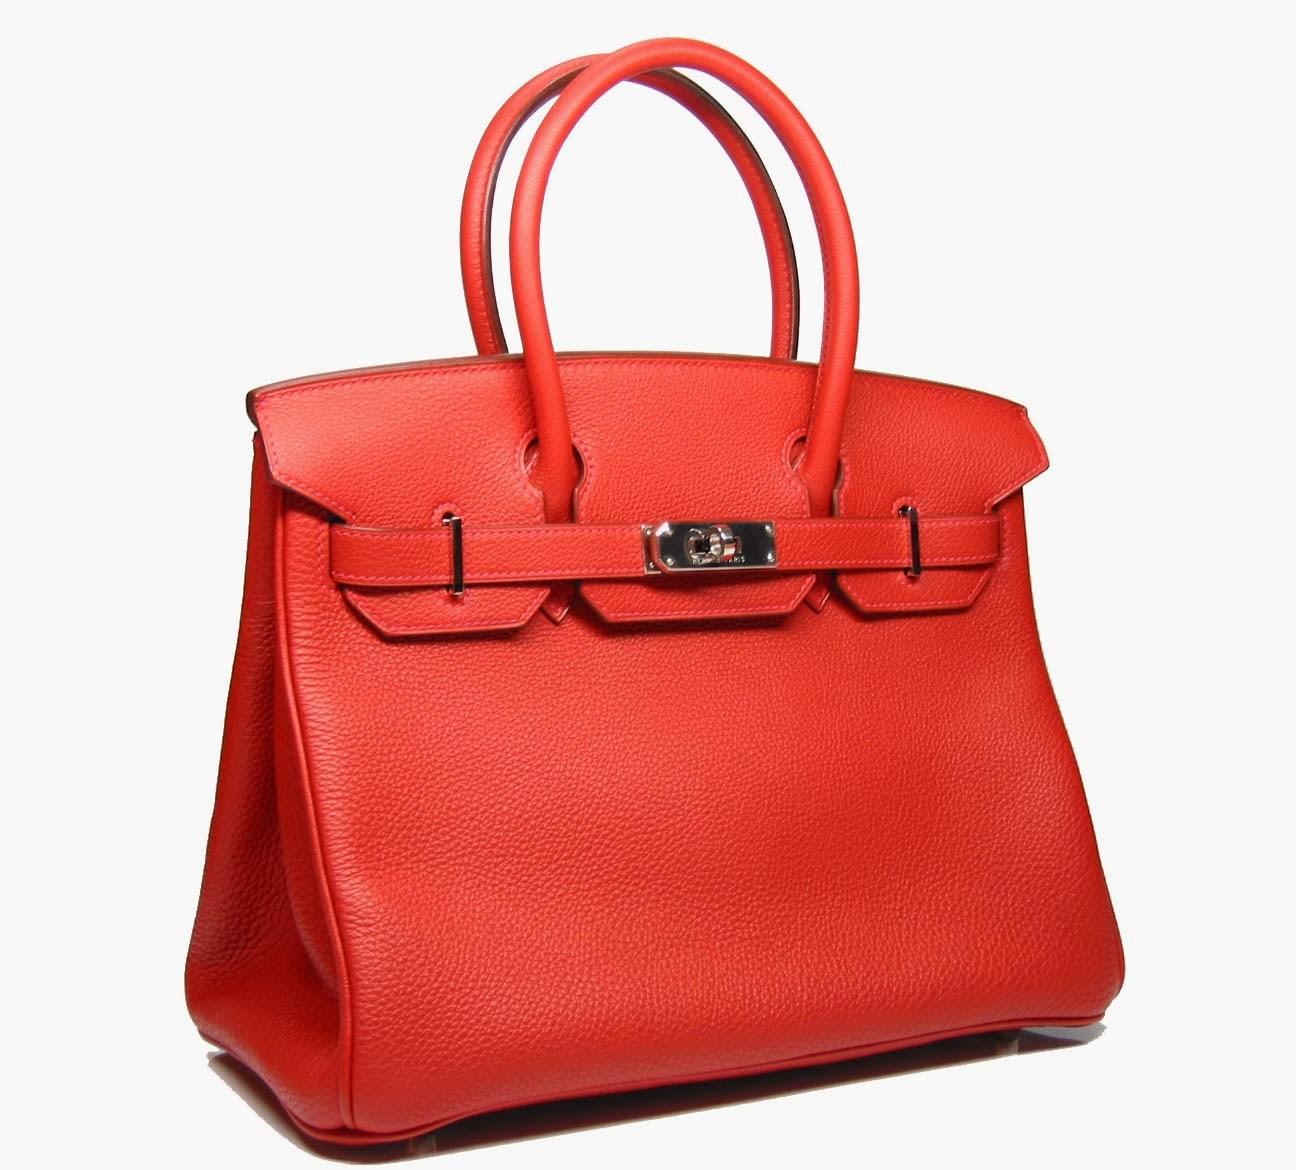 3fc1a2be0855 Hermes Birkin Bag Price List